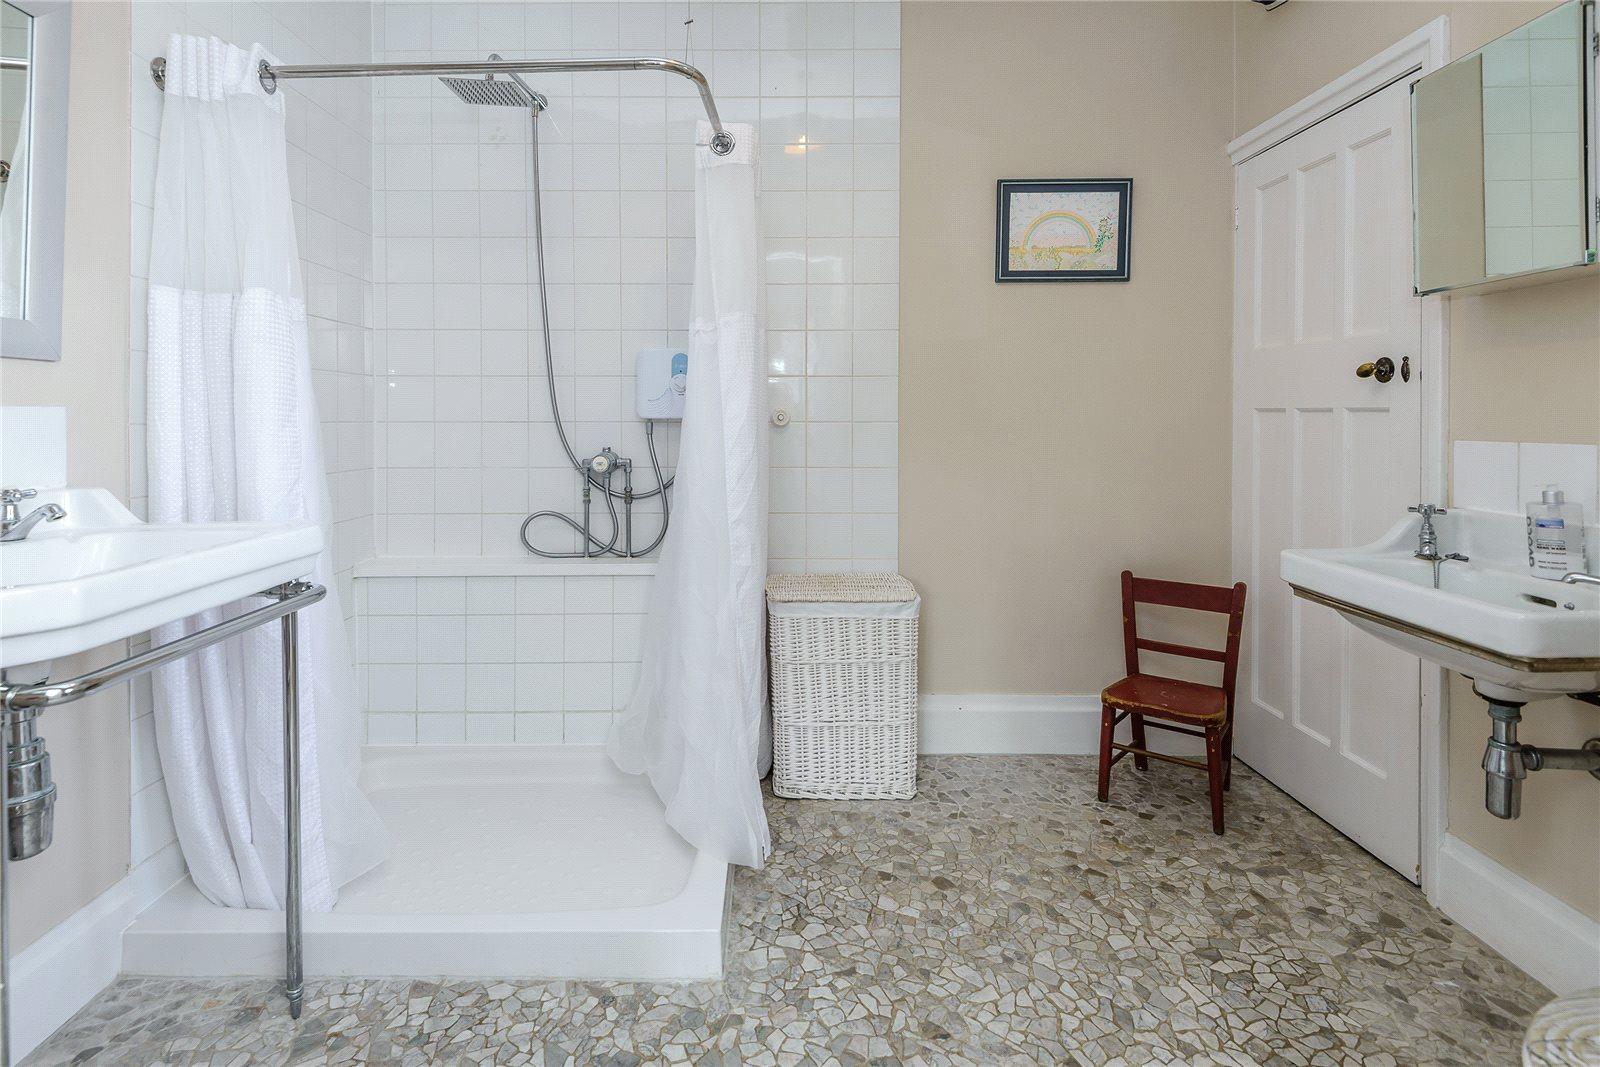 Bathroom Mirrors Guildford horsham road, bramley, guildford, surrey, gu5, a luxury home for